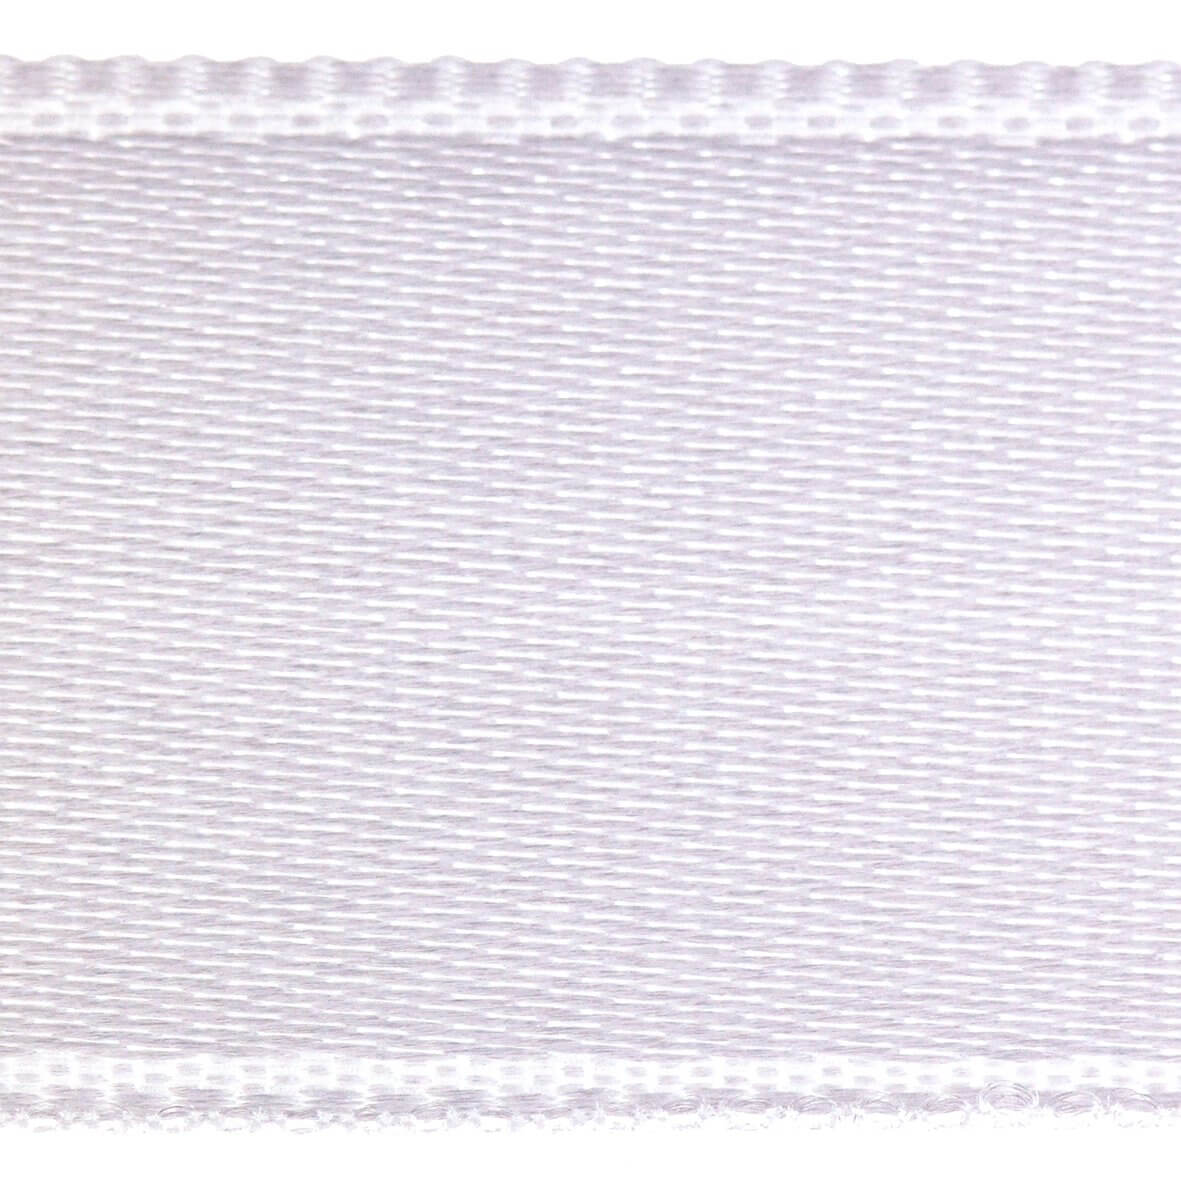 Soft White Col. 201 - 25mm Satab Satin Ribbon